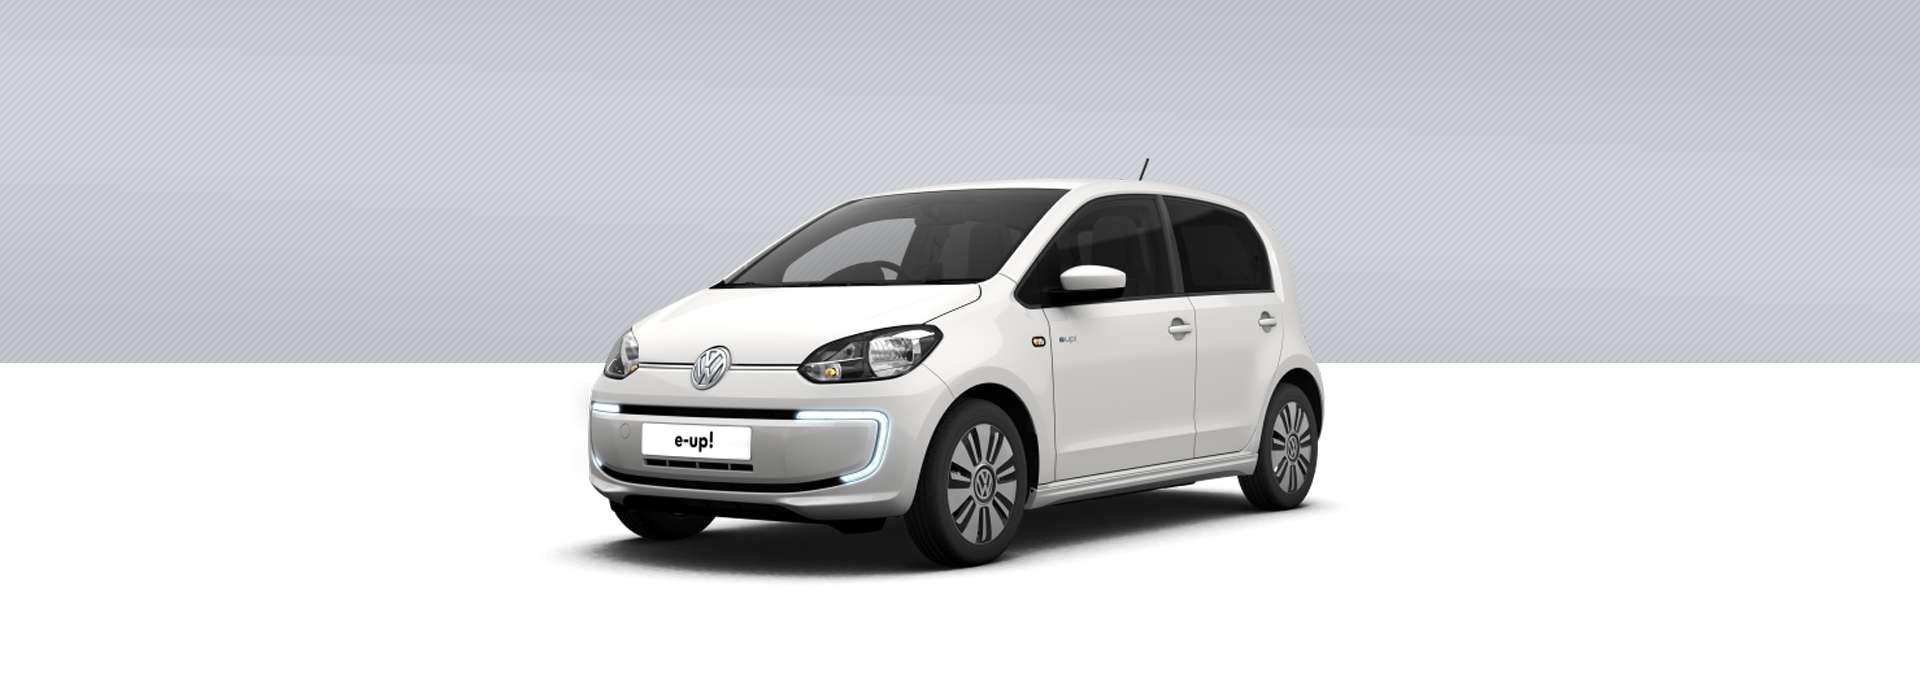 Volkswagen Nuevo E-Up!